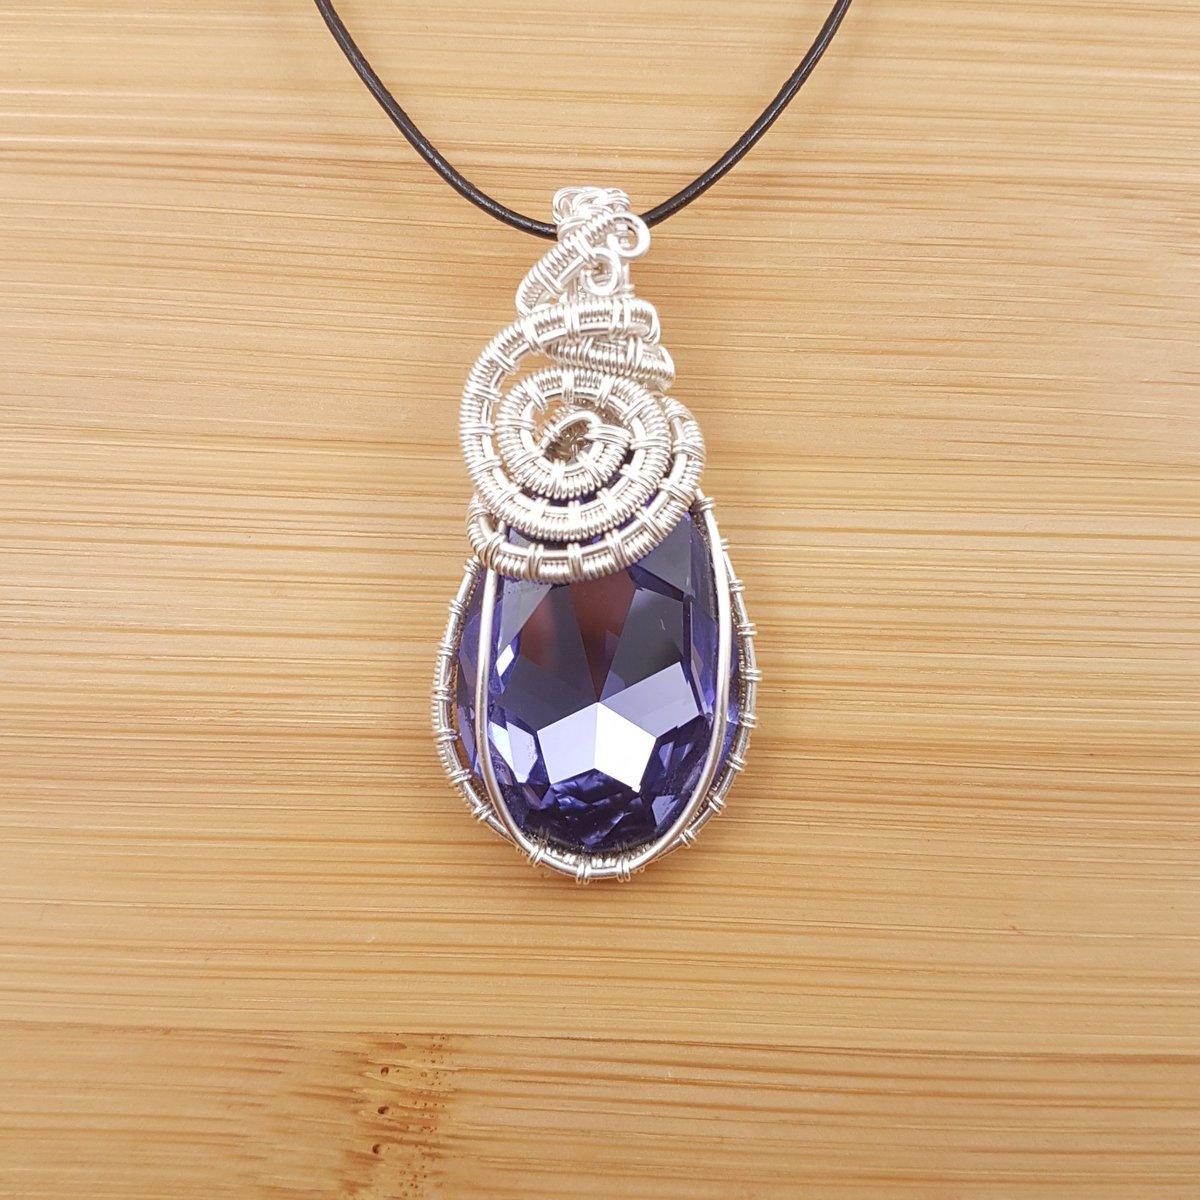 Light purple Swarovski drop pendant wrapped in silver wire